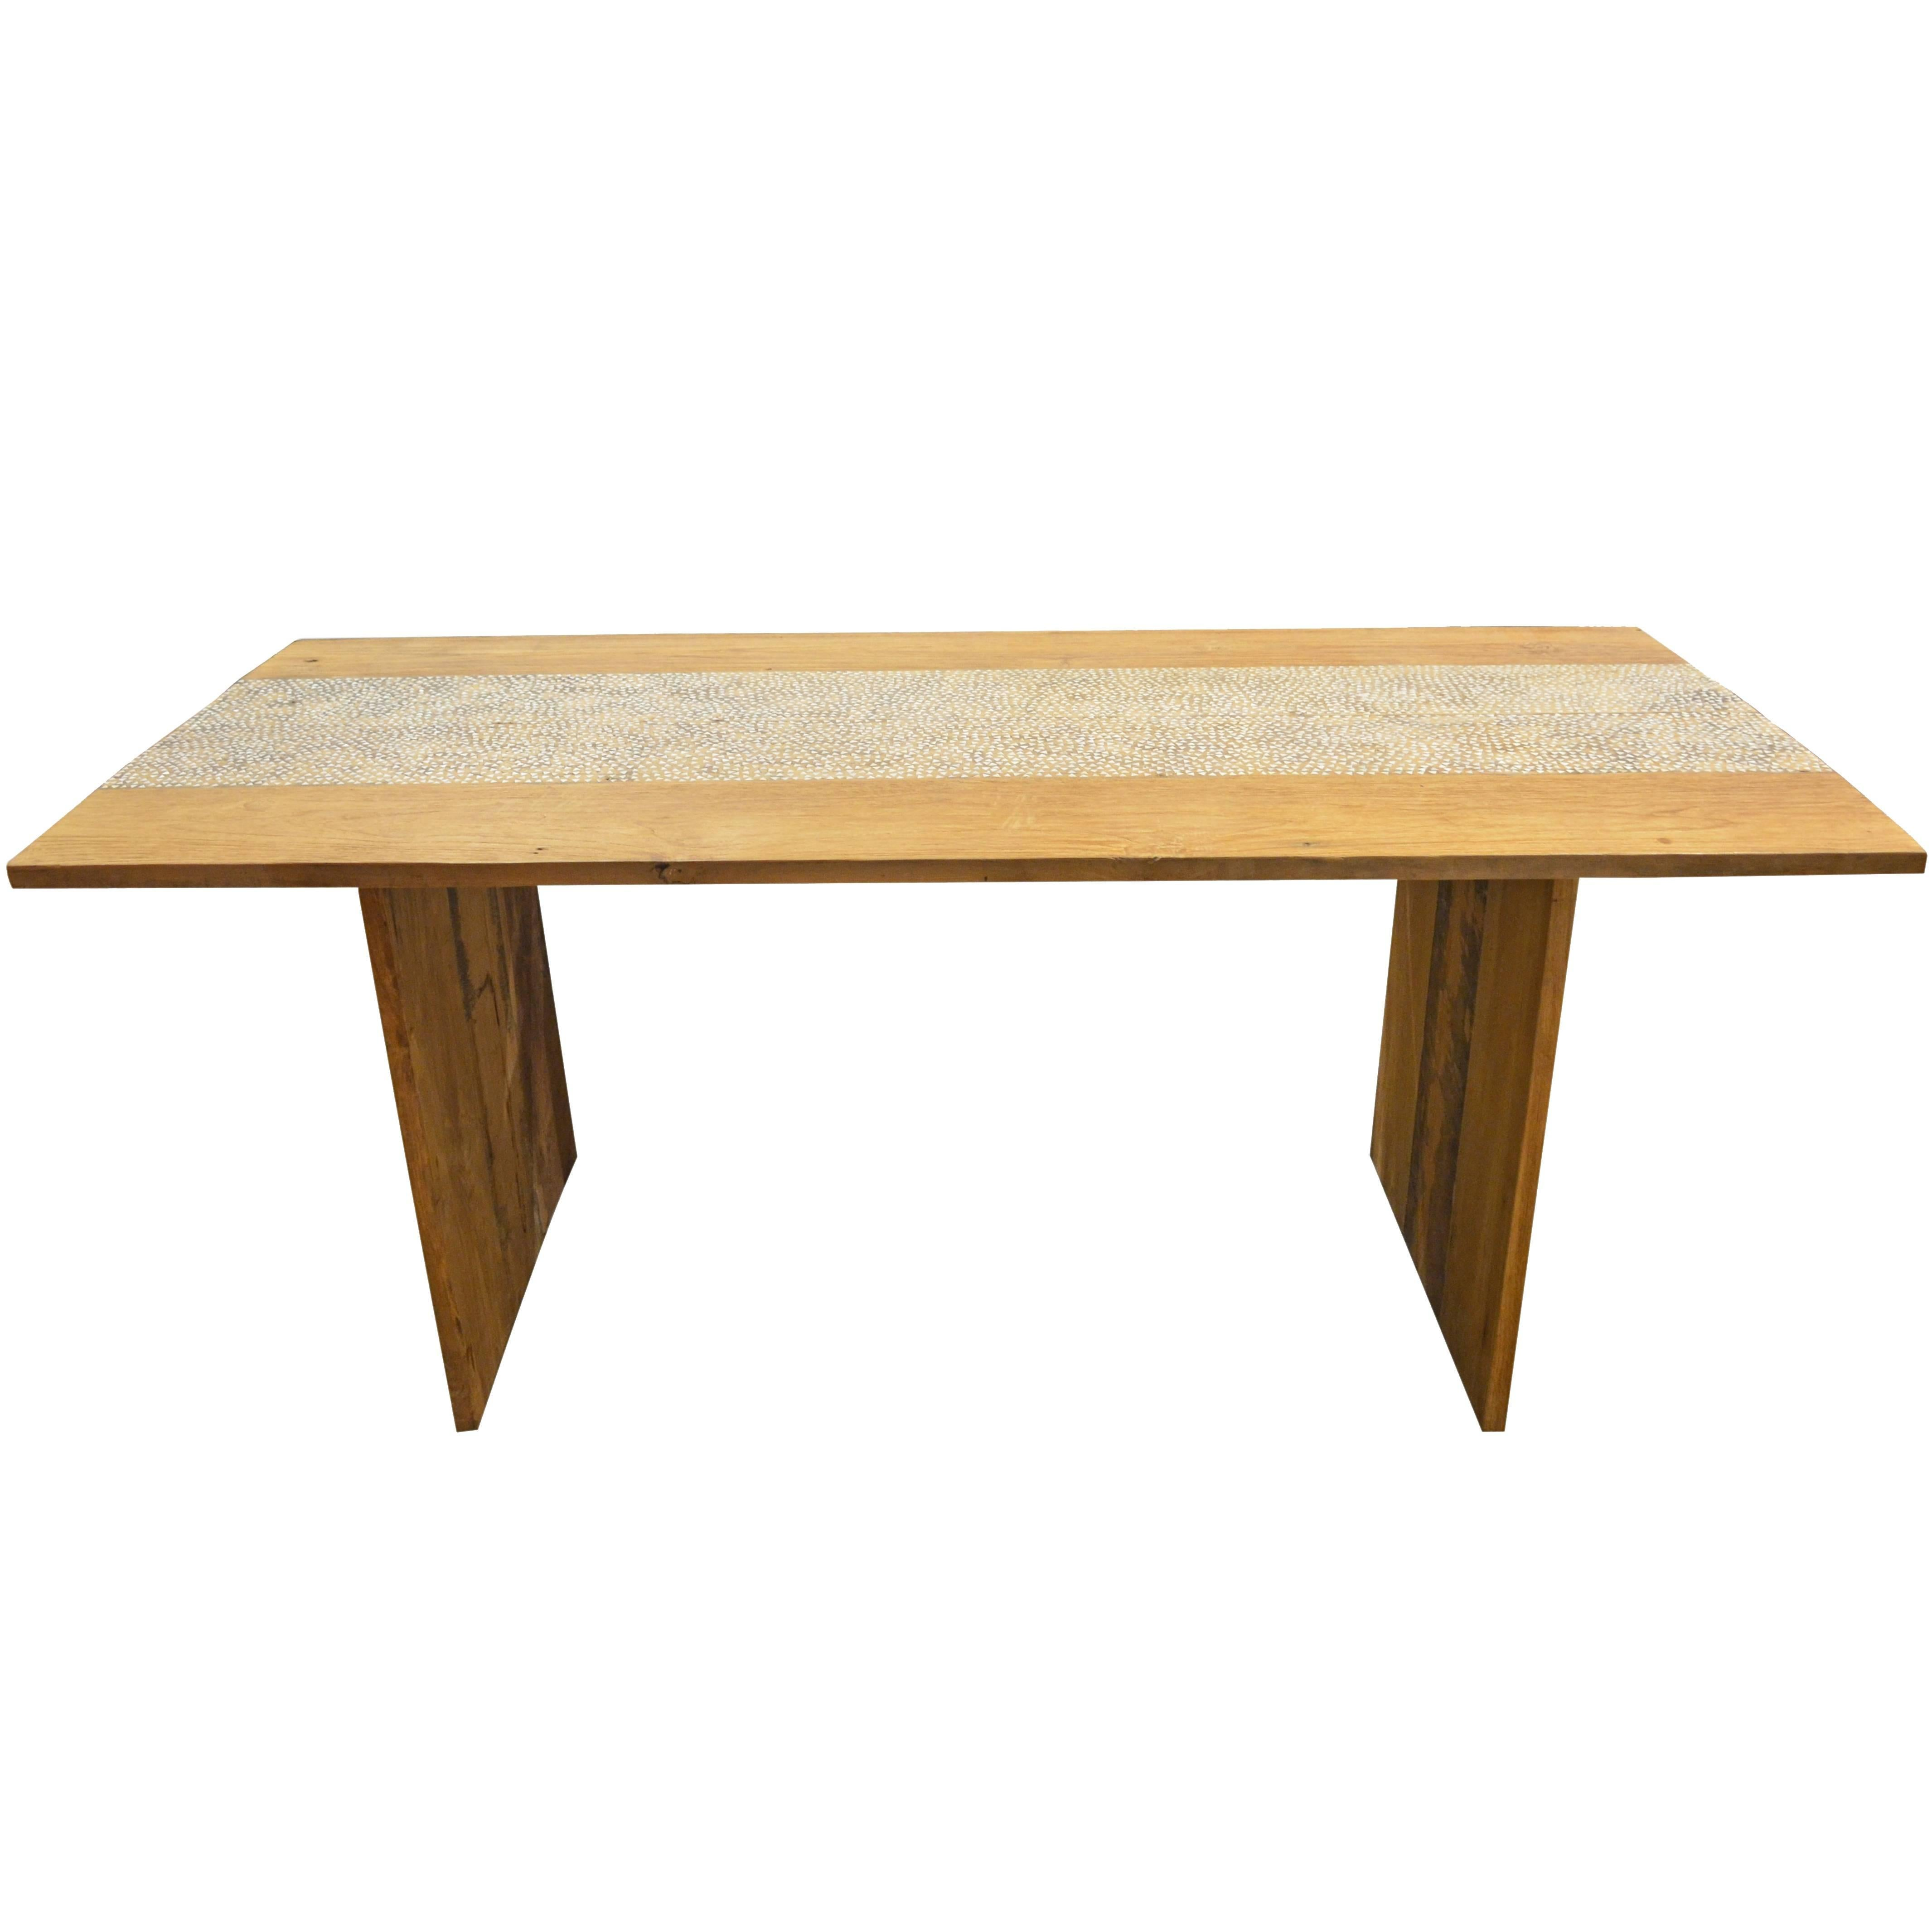 Andrianna Shamaris Shell Inlay Teak Wood Dining Table